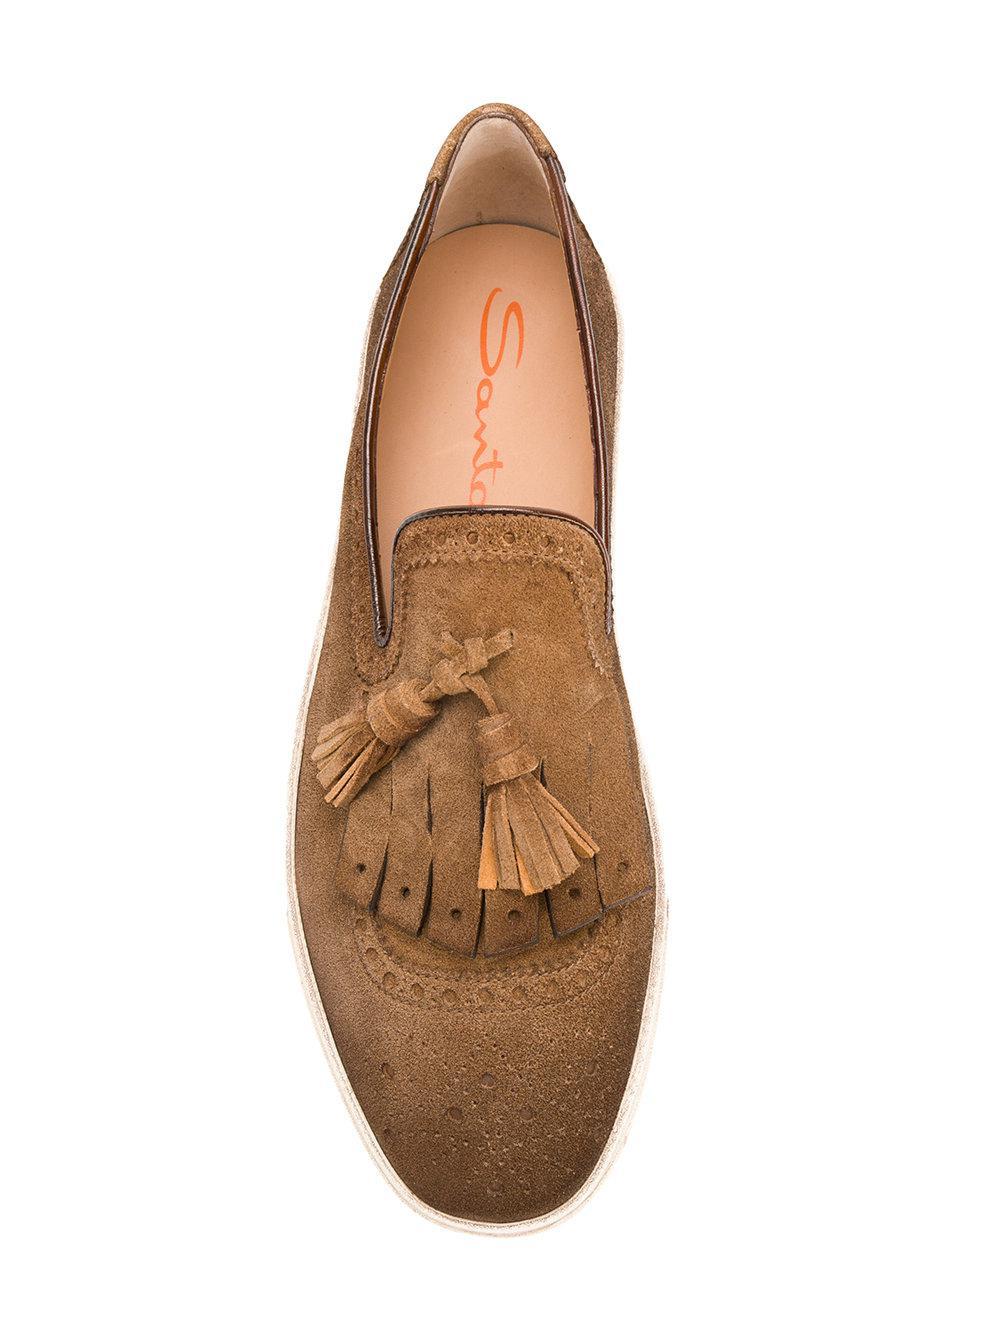 3fa109d566d Lyst - Santoni Tassel Loafers in Brown